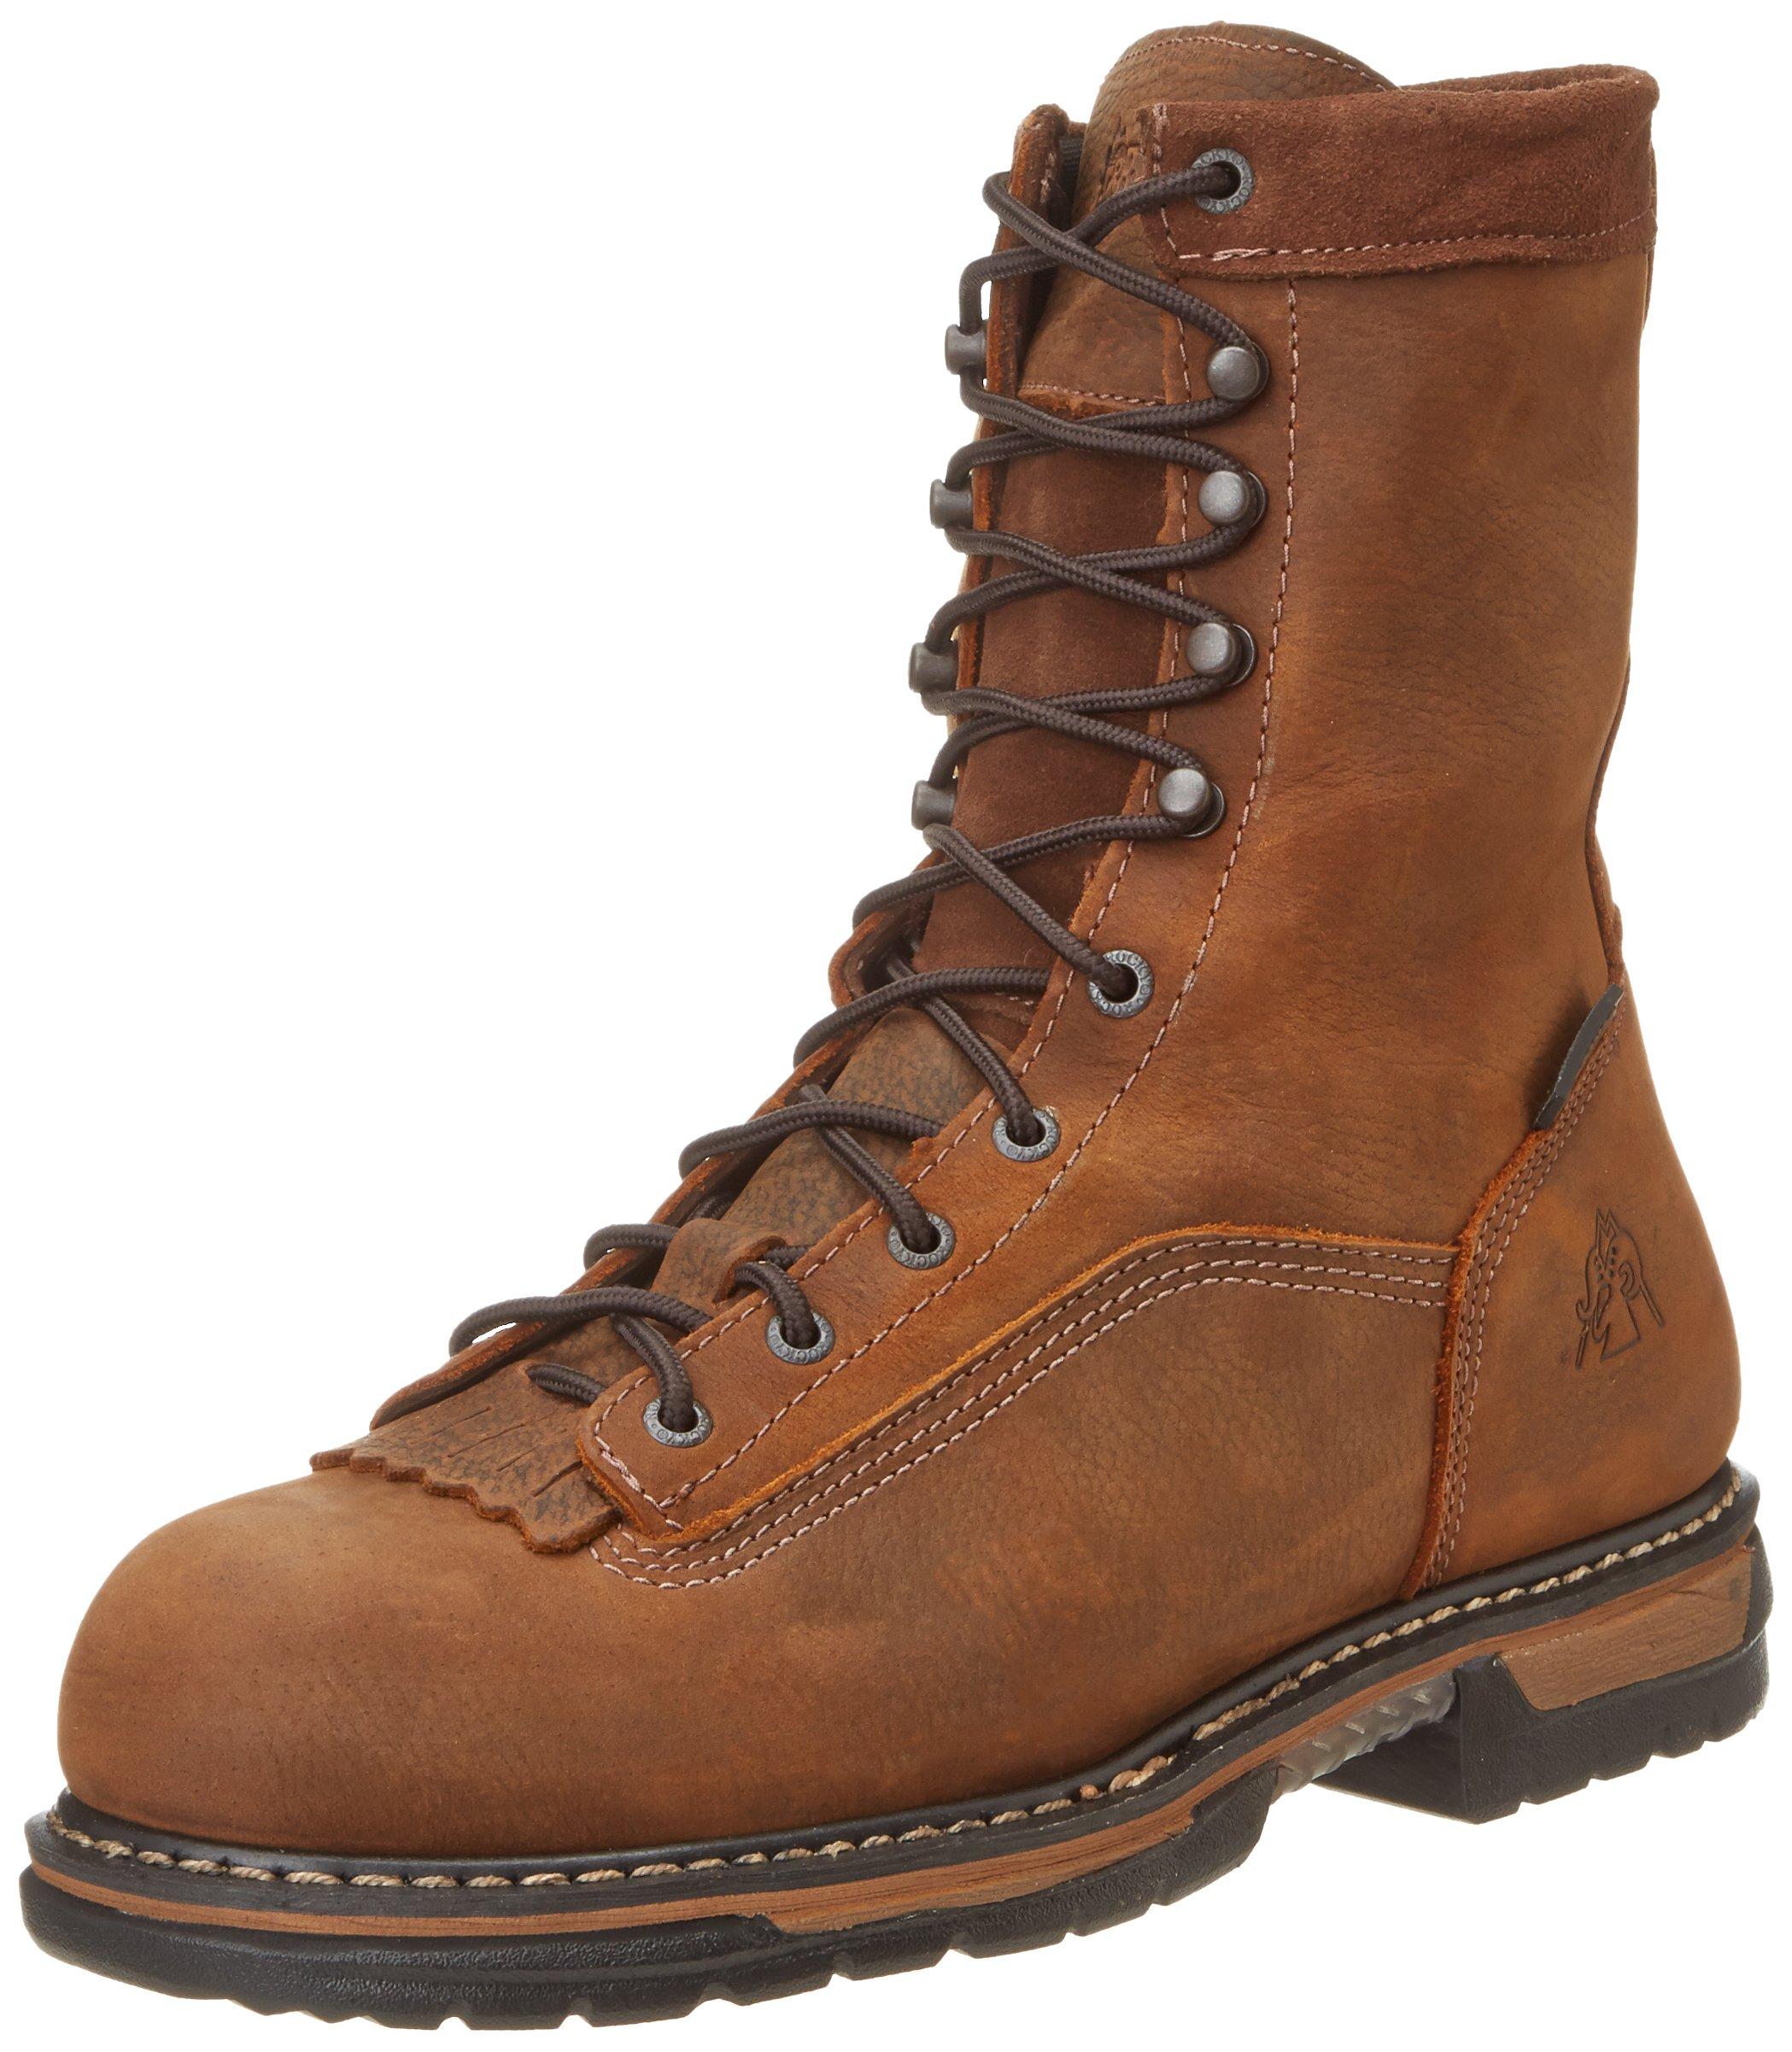 Rocky Men's Iron Clad Eight Inch LTT Steel Toe Work Boot,Brown,13 M US by Rocky (Image #1)